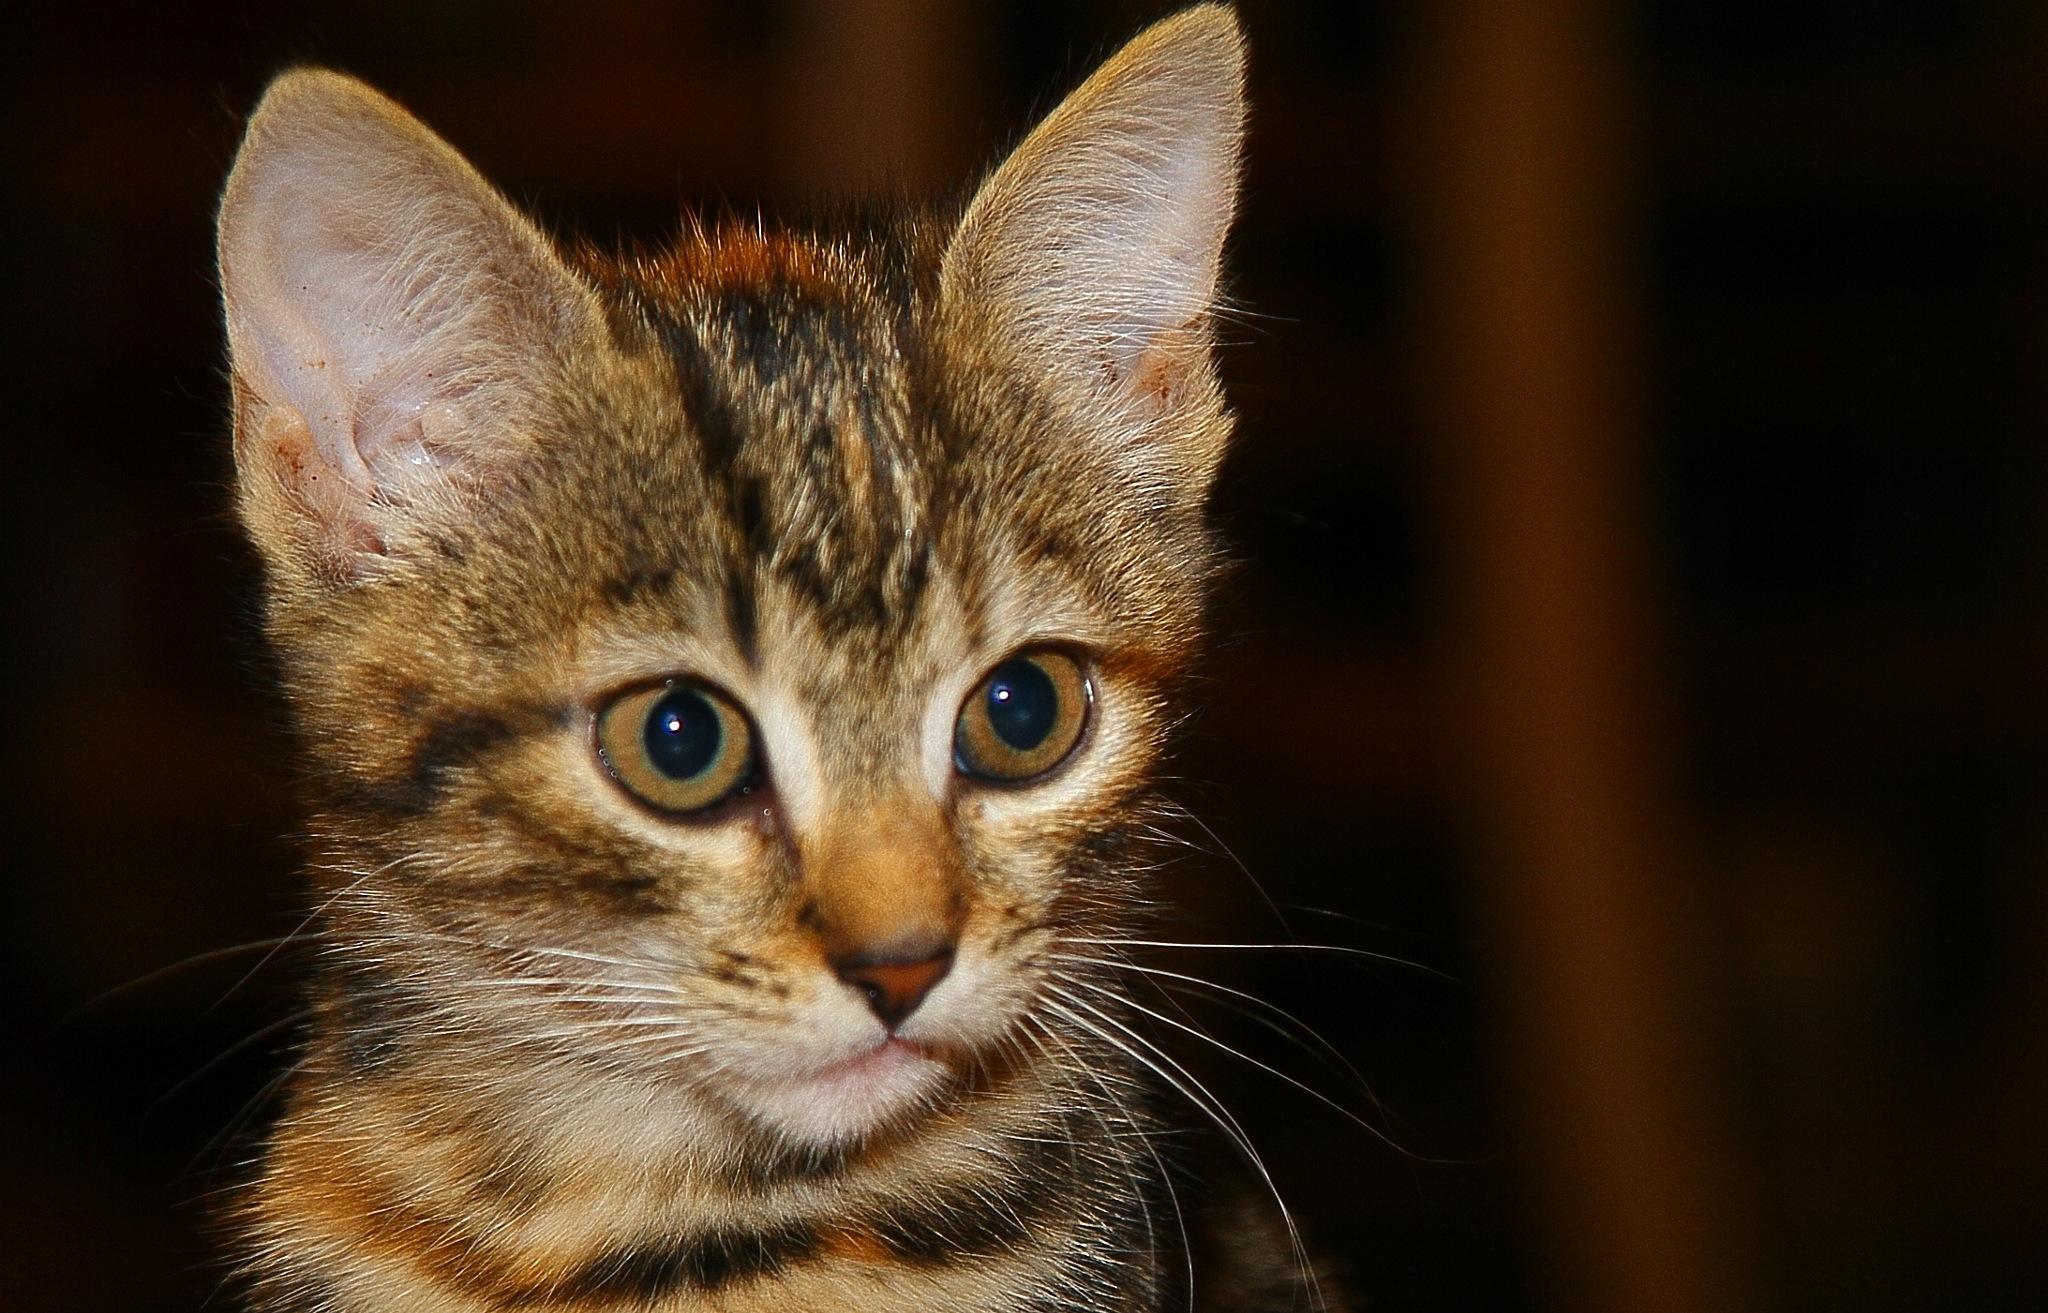 Kitten 3 by Thomas Lenz